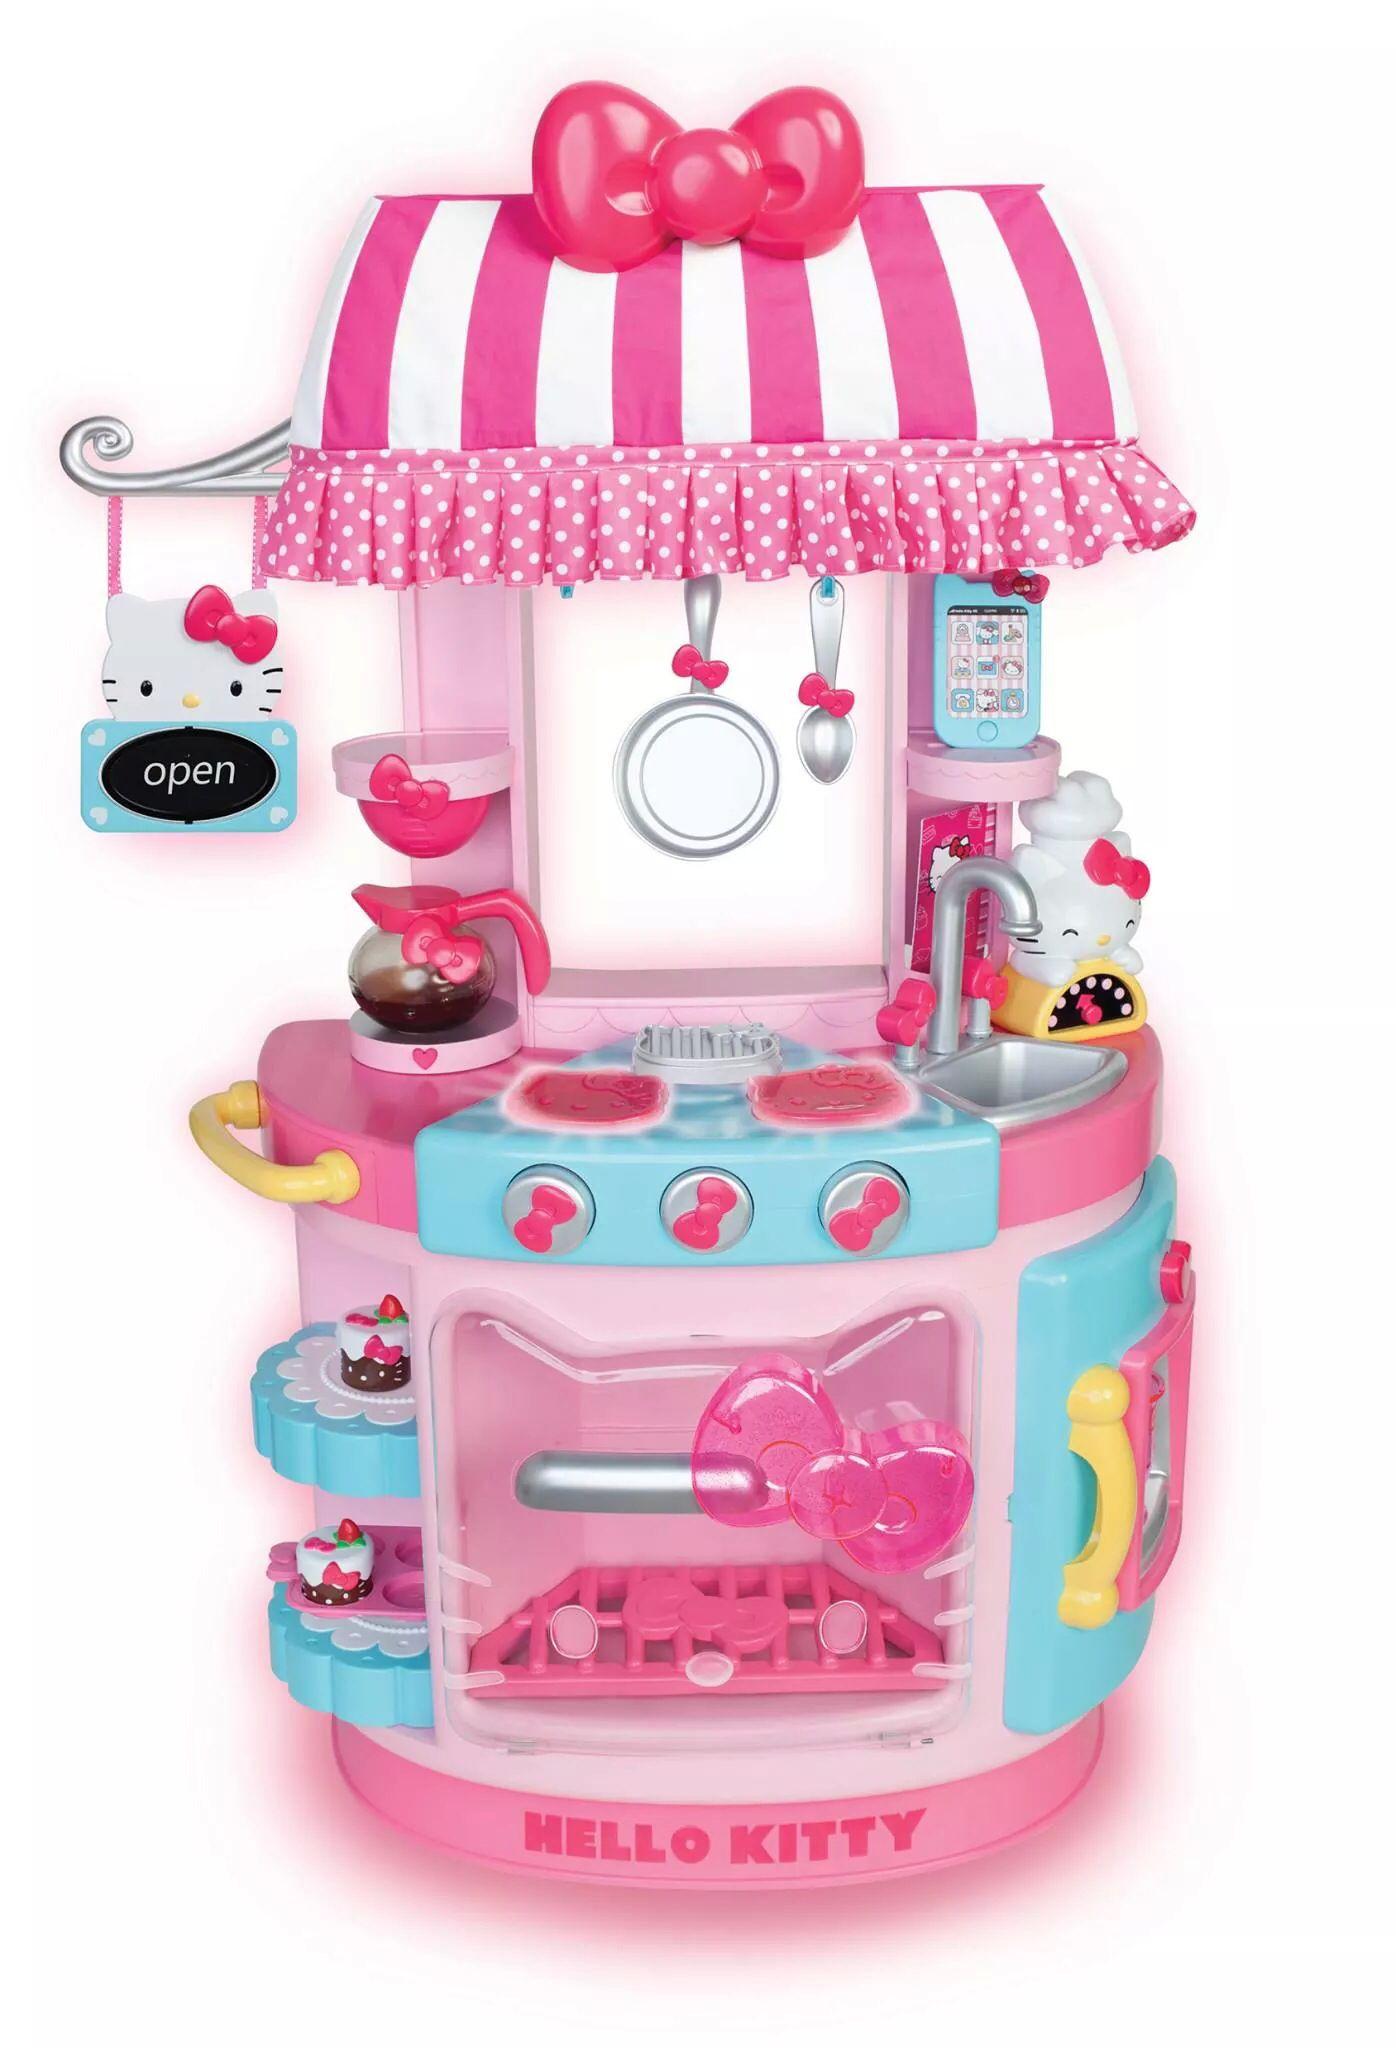 Hello kitty car toys r us  Hello Kitty play kitchen at ToyRis Walmart  Hello Kitty